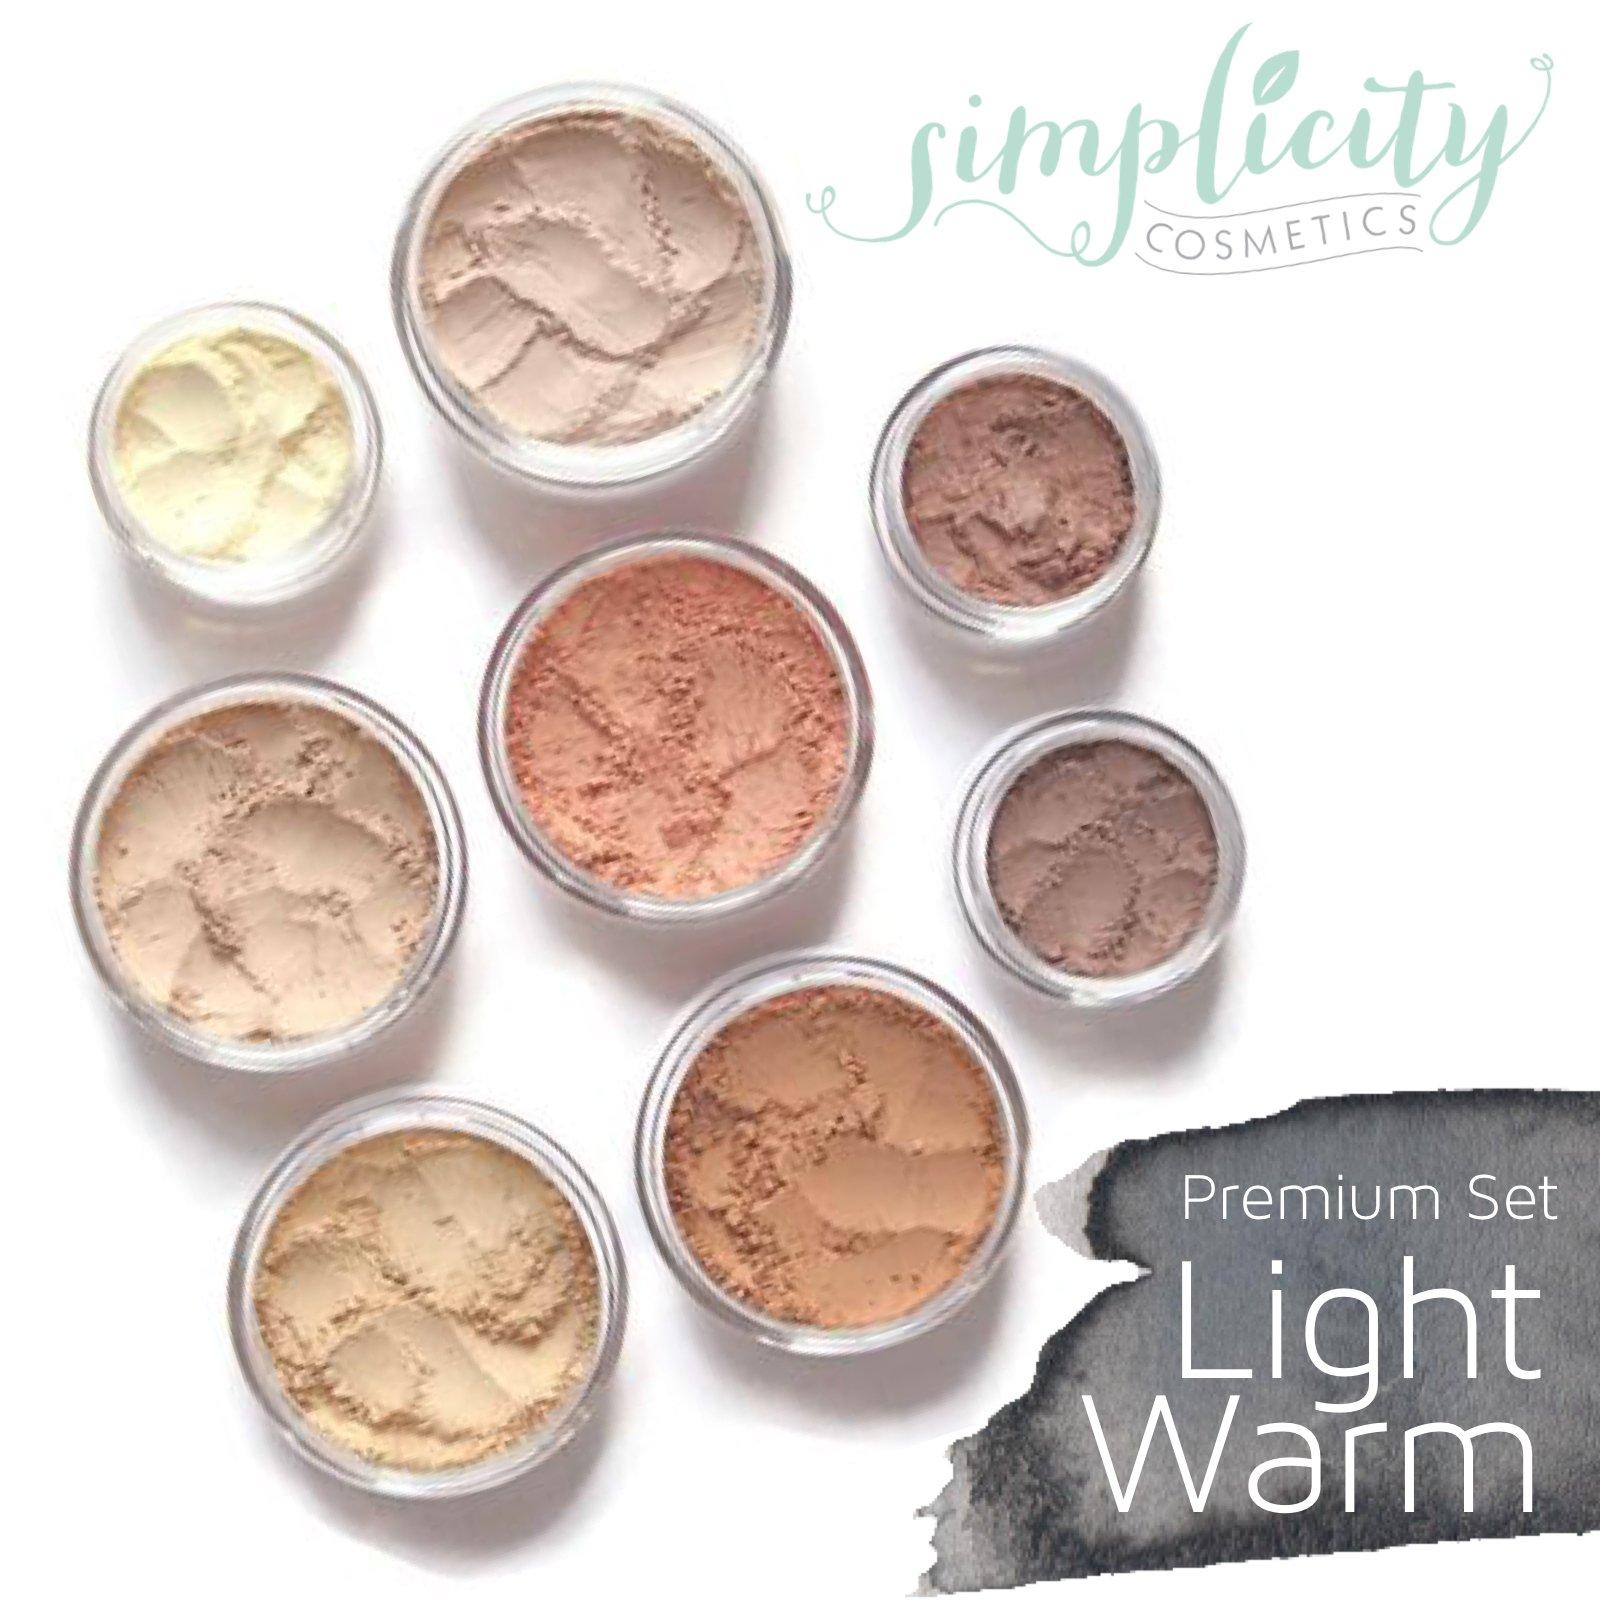 Mineral Makeup Premium Set - Pale   Blush   Foundation   Sheer Powder   Eyeshadow   Bronzer   Under Eye Concealer   Starter Set